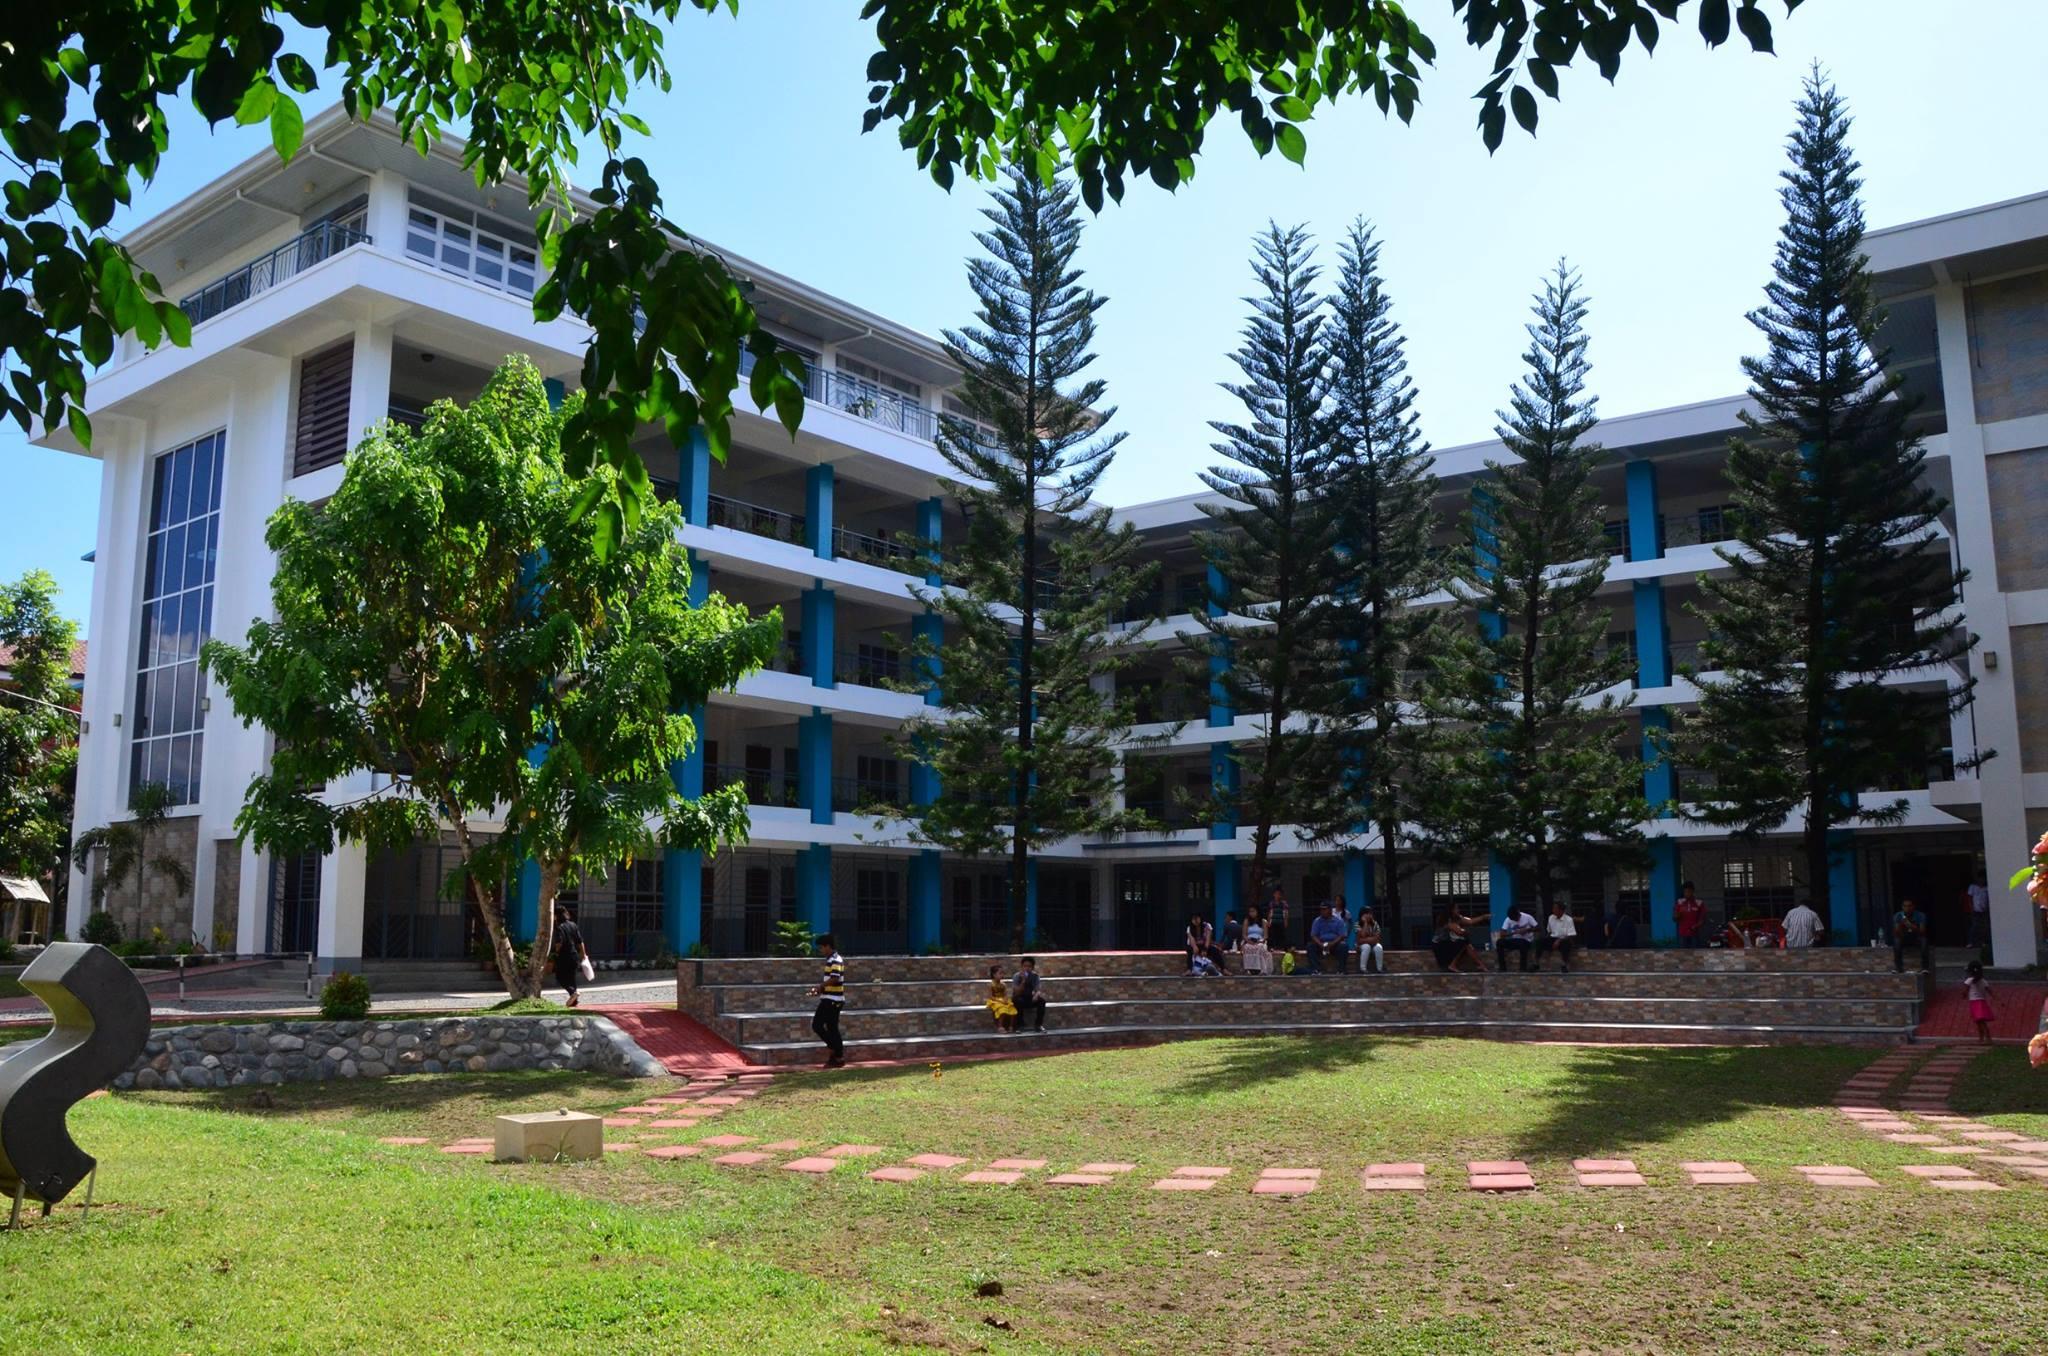 image of saint mary's university senior high school building